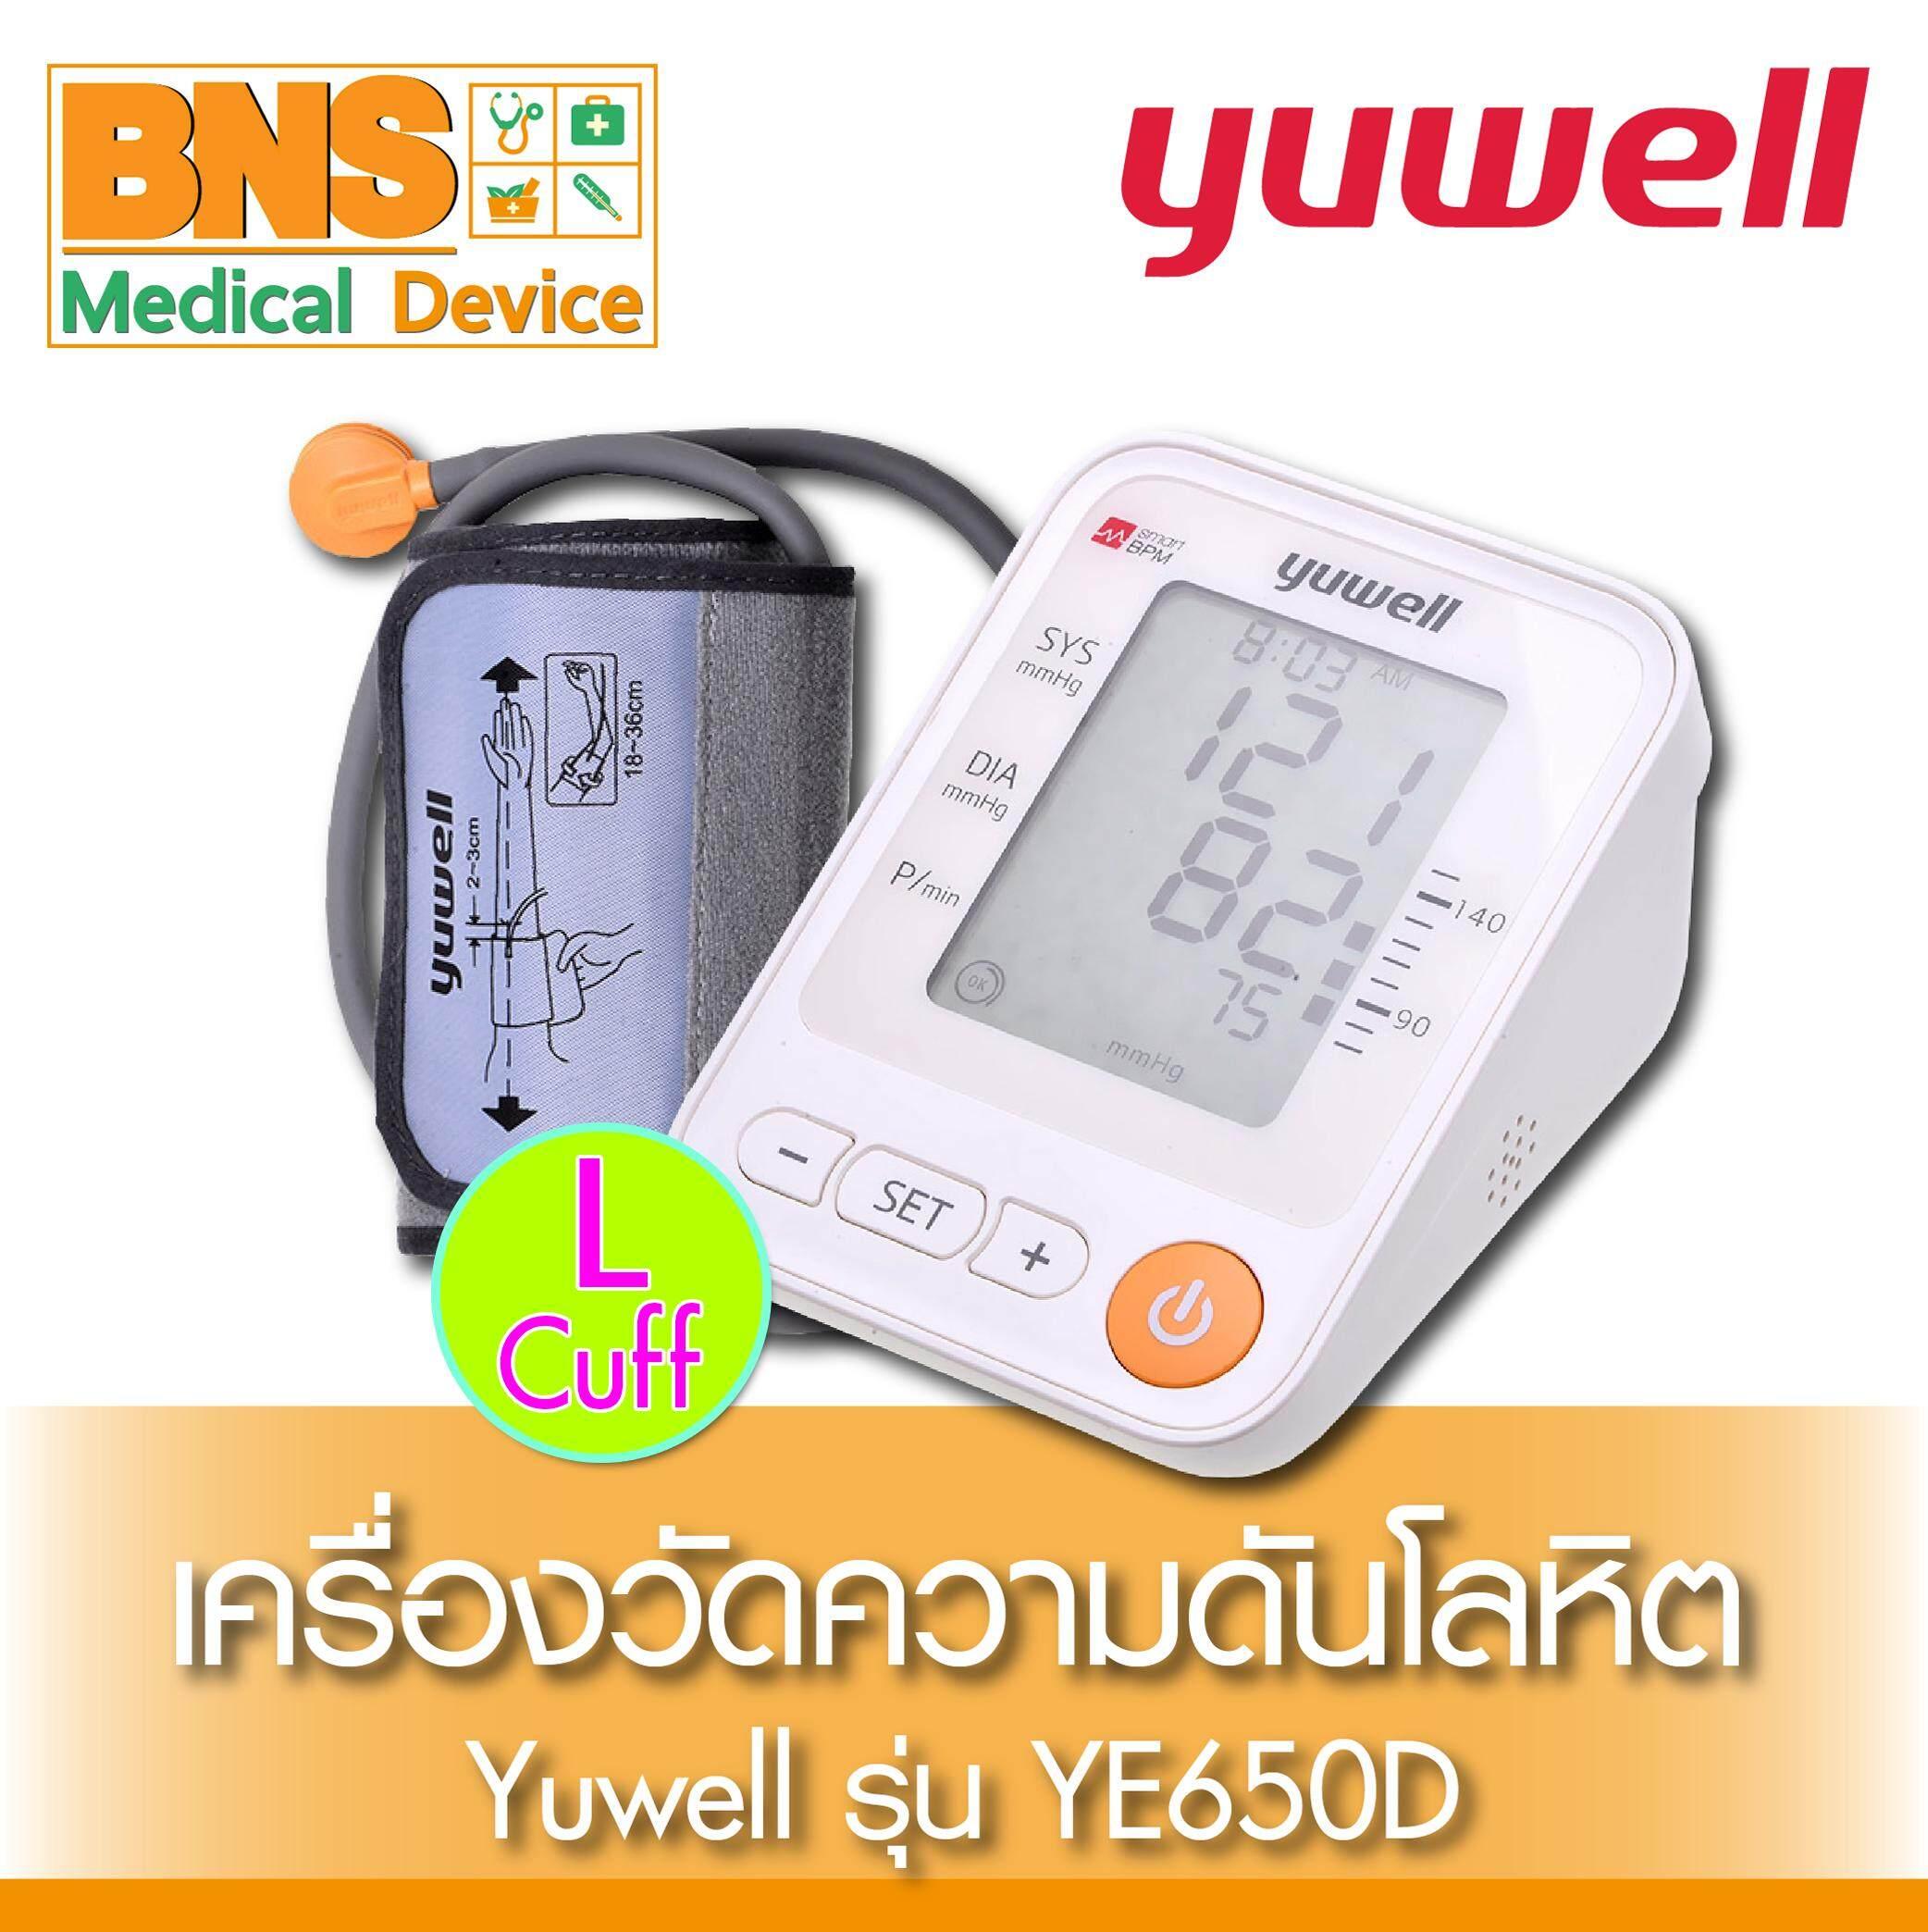 Yuwell YE650D ยูเวล เครื่องวัดความดันโลหิต L Cuff (มีรับประกัน) (ถูกที่สุด) By BNS